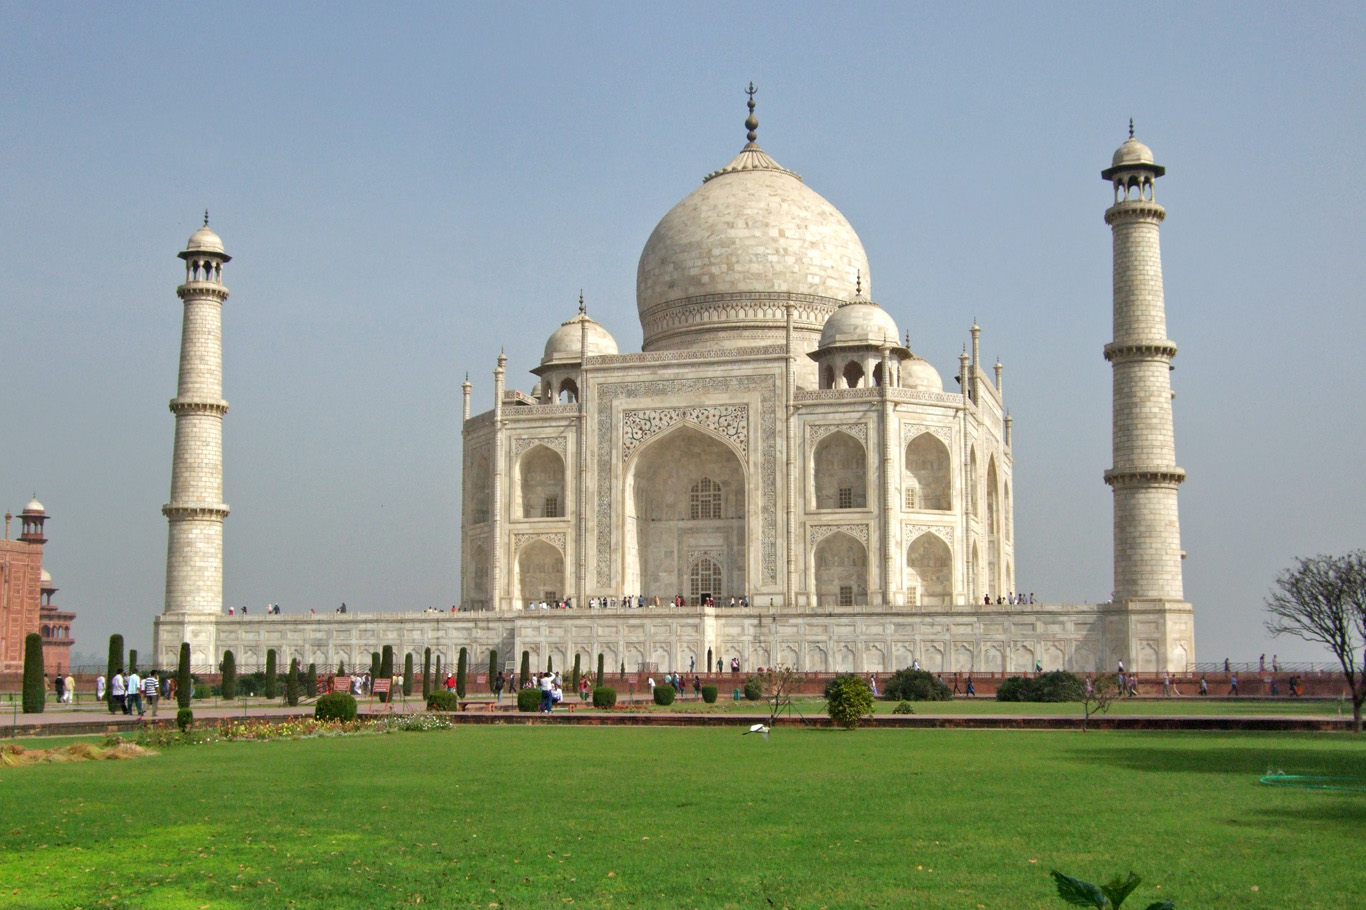 Taj Mahal - The Mausoleum